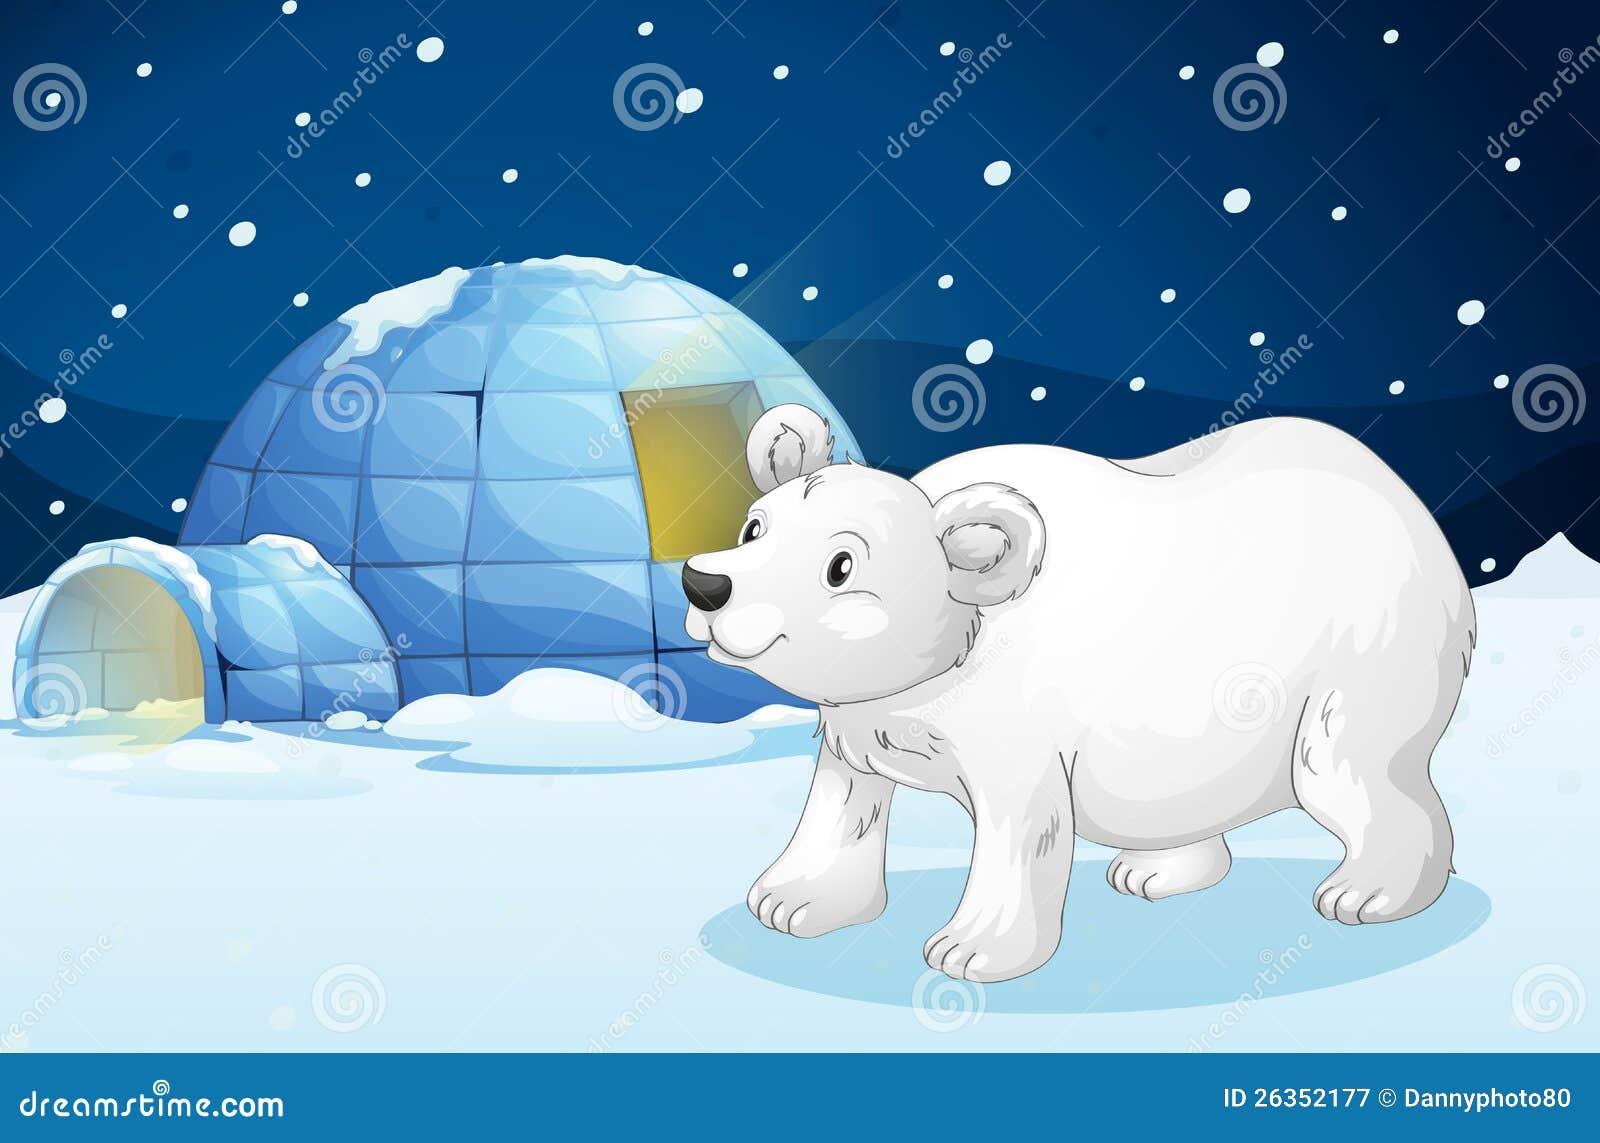 white bear and igloo stock vector  image of animal  protection